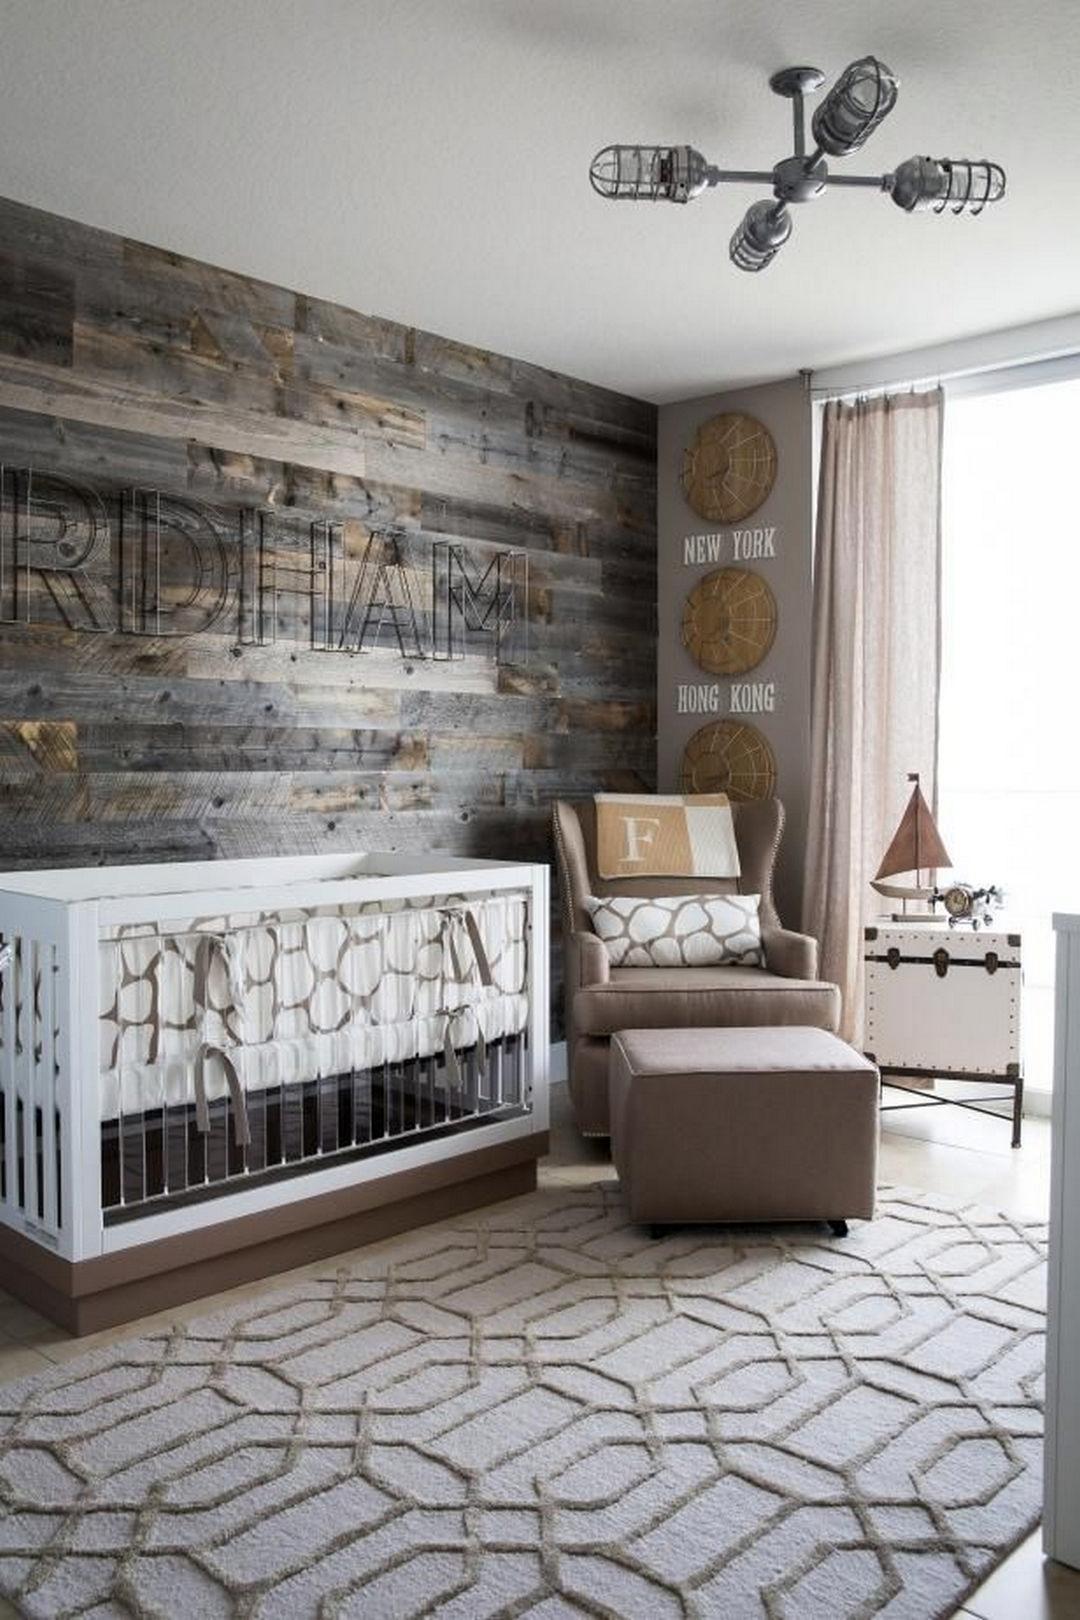 Baby Boy Room Themes Travel: Monash Caulfield: A Flexible Café Space